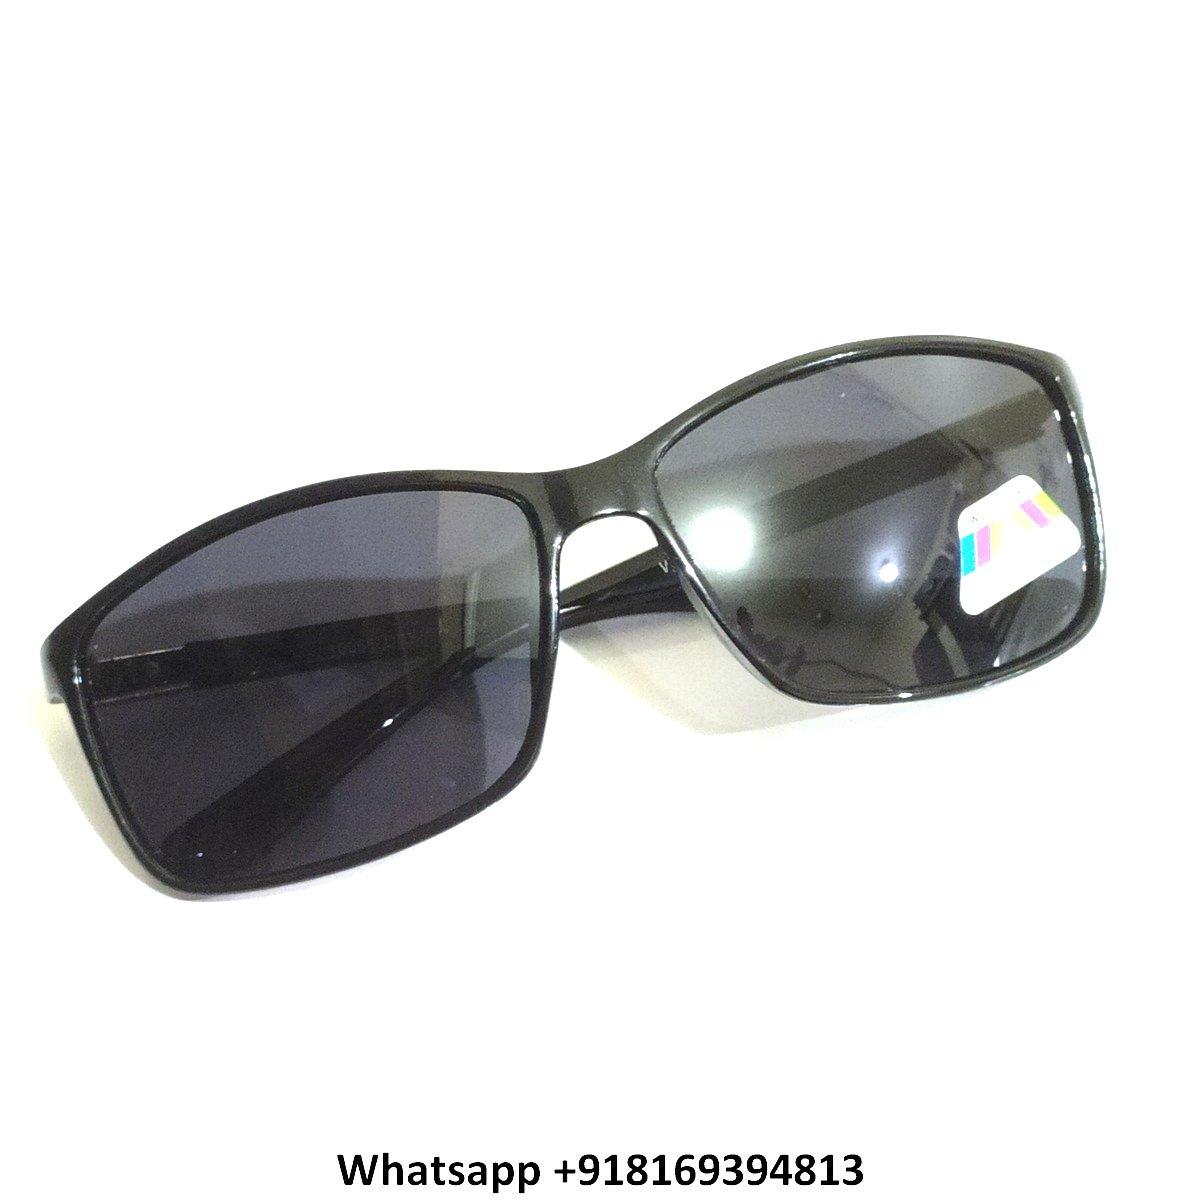 Wraparound Sports Polarized Sunglasses for Men and Women 10066SBK